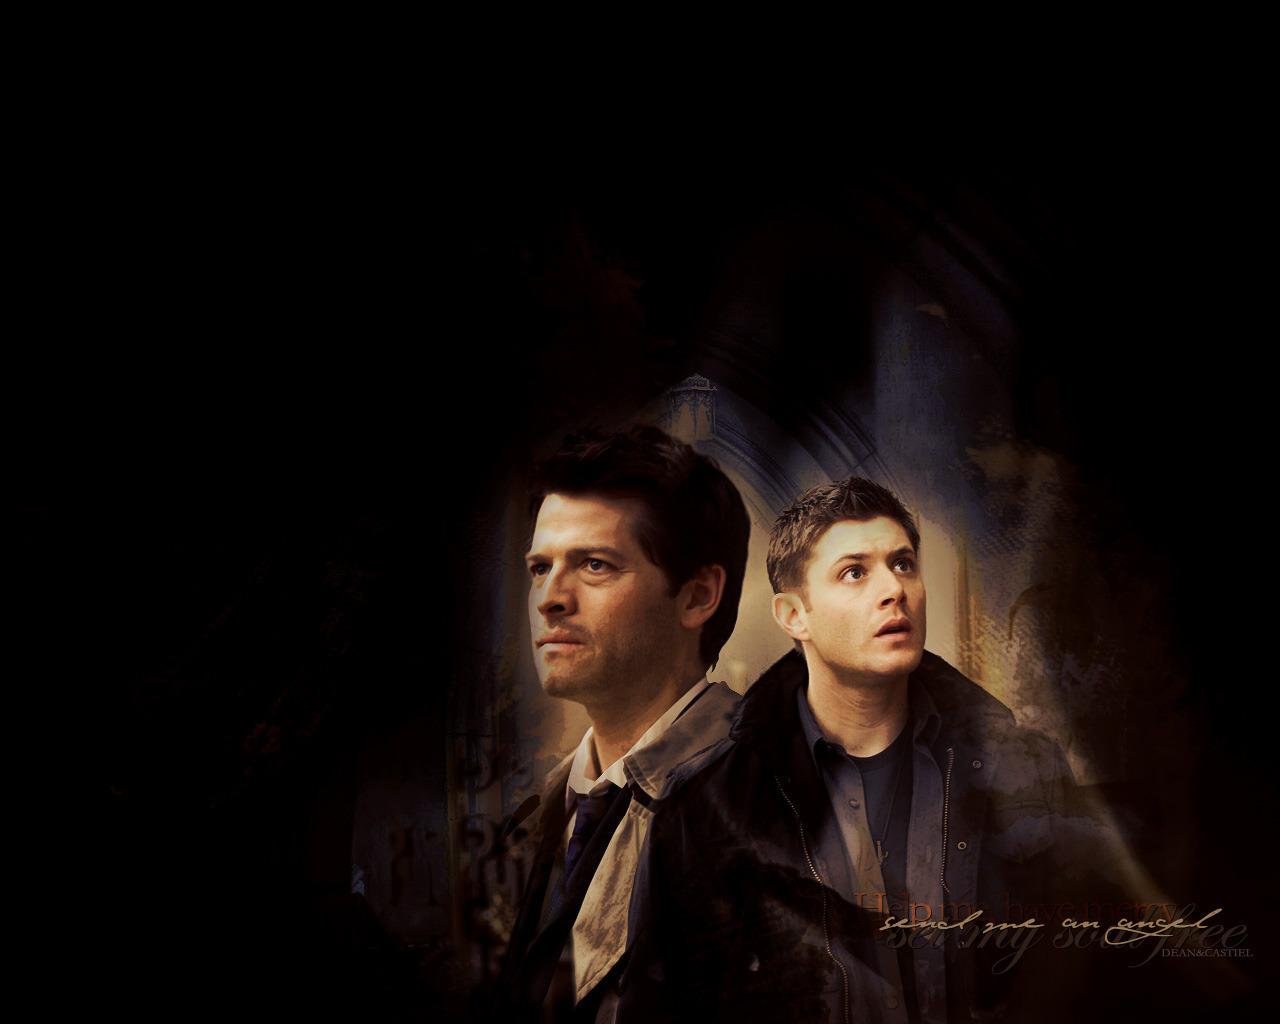 Dean and castiel images dean amp castiel hd wallpaper and background